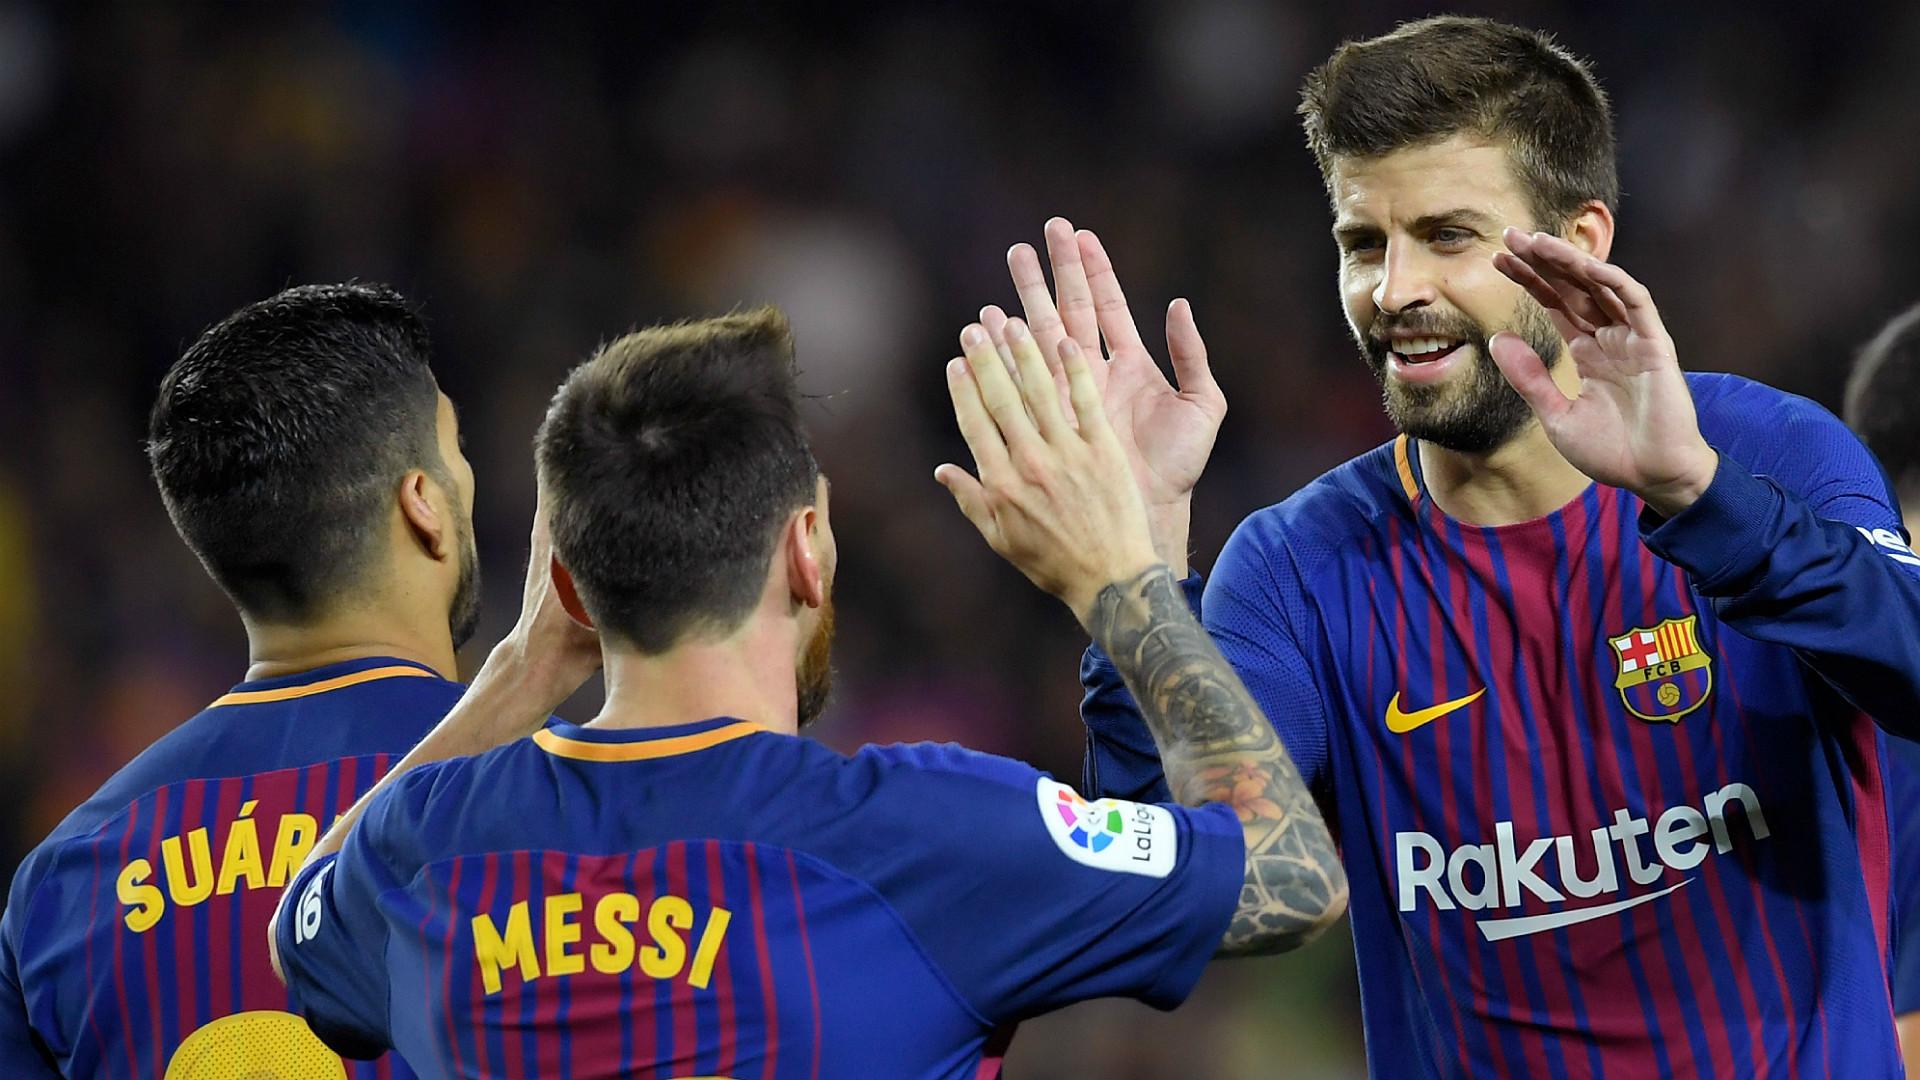 Suarez Messi Pique Barcelona Espanyol La Liga